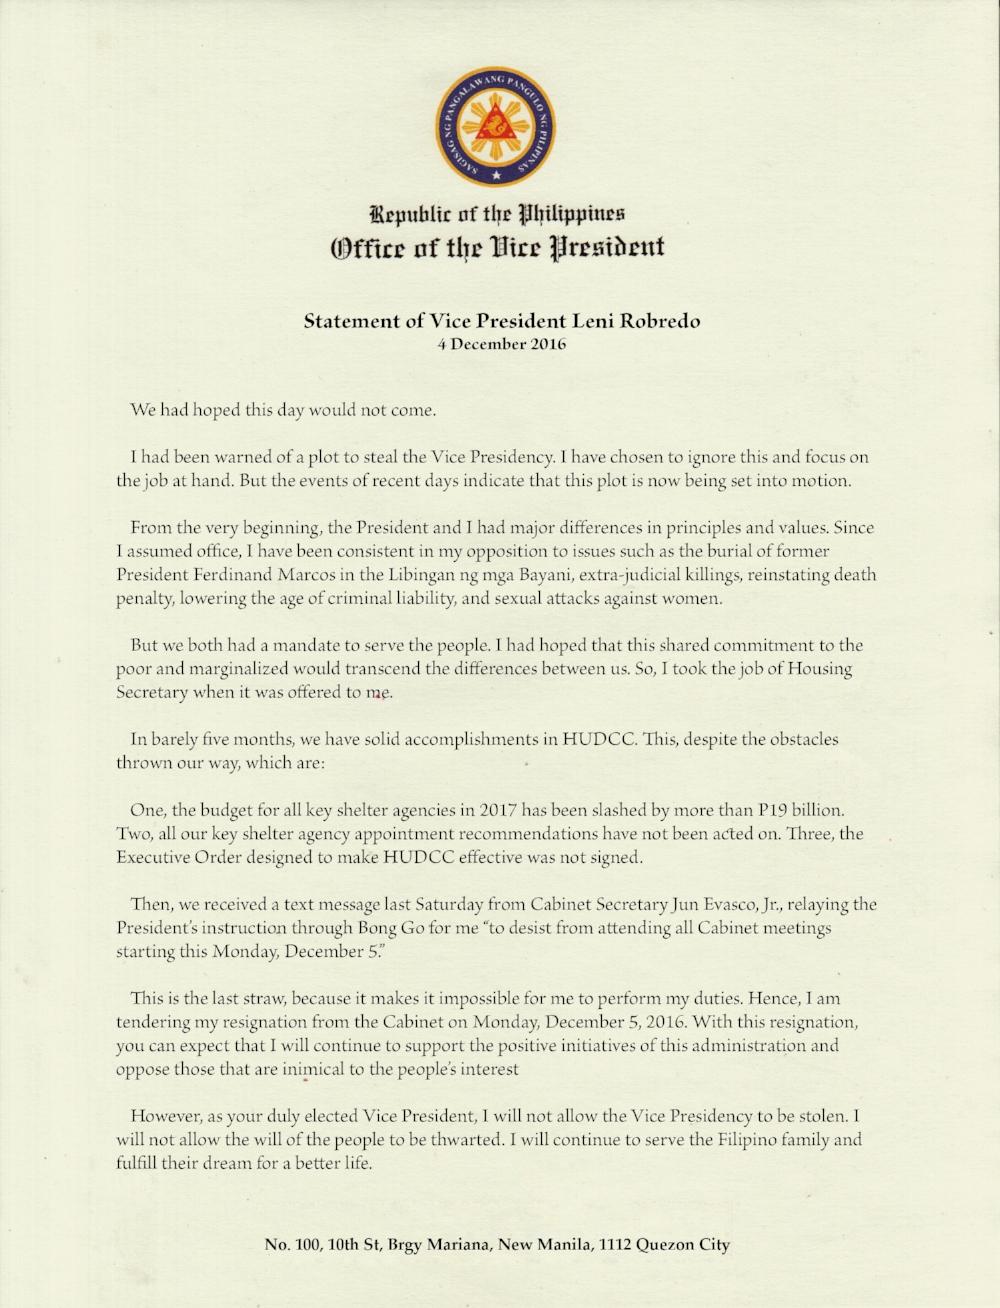 VP Robredo Cabinet Resignation